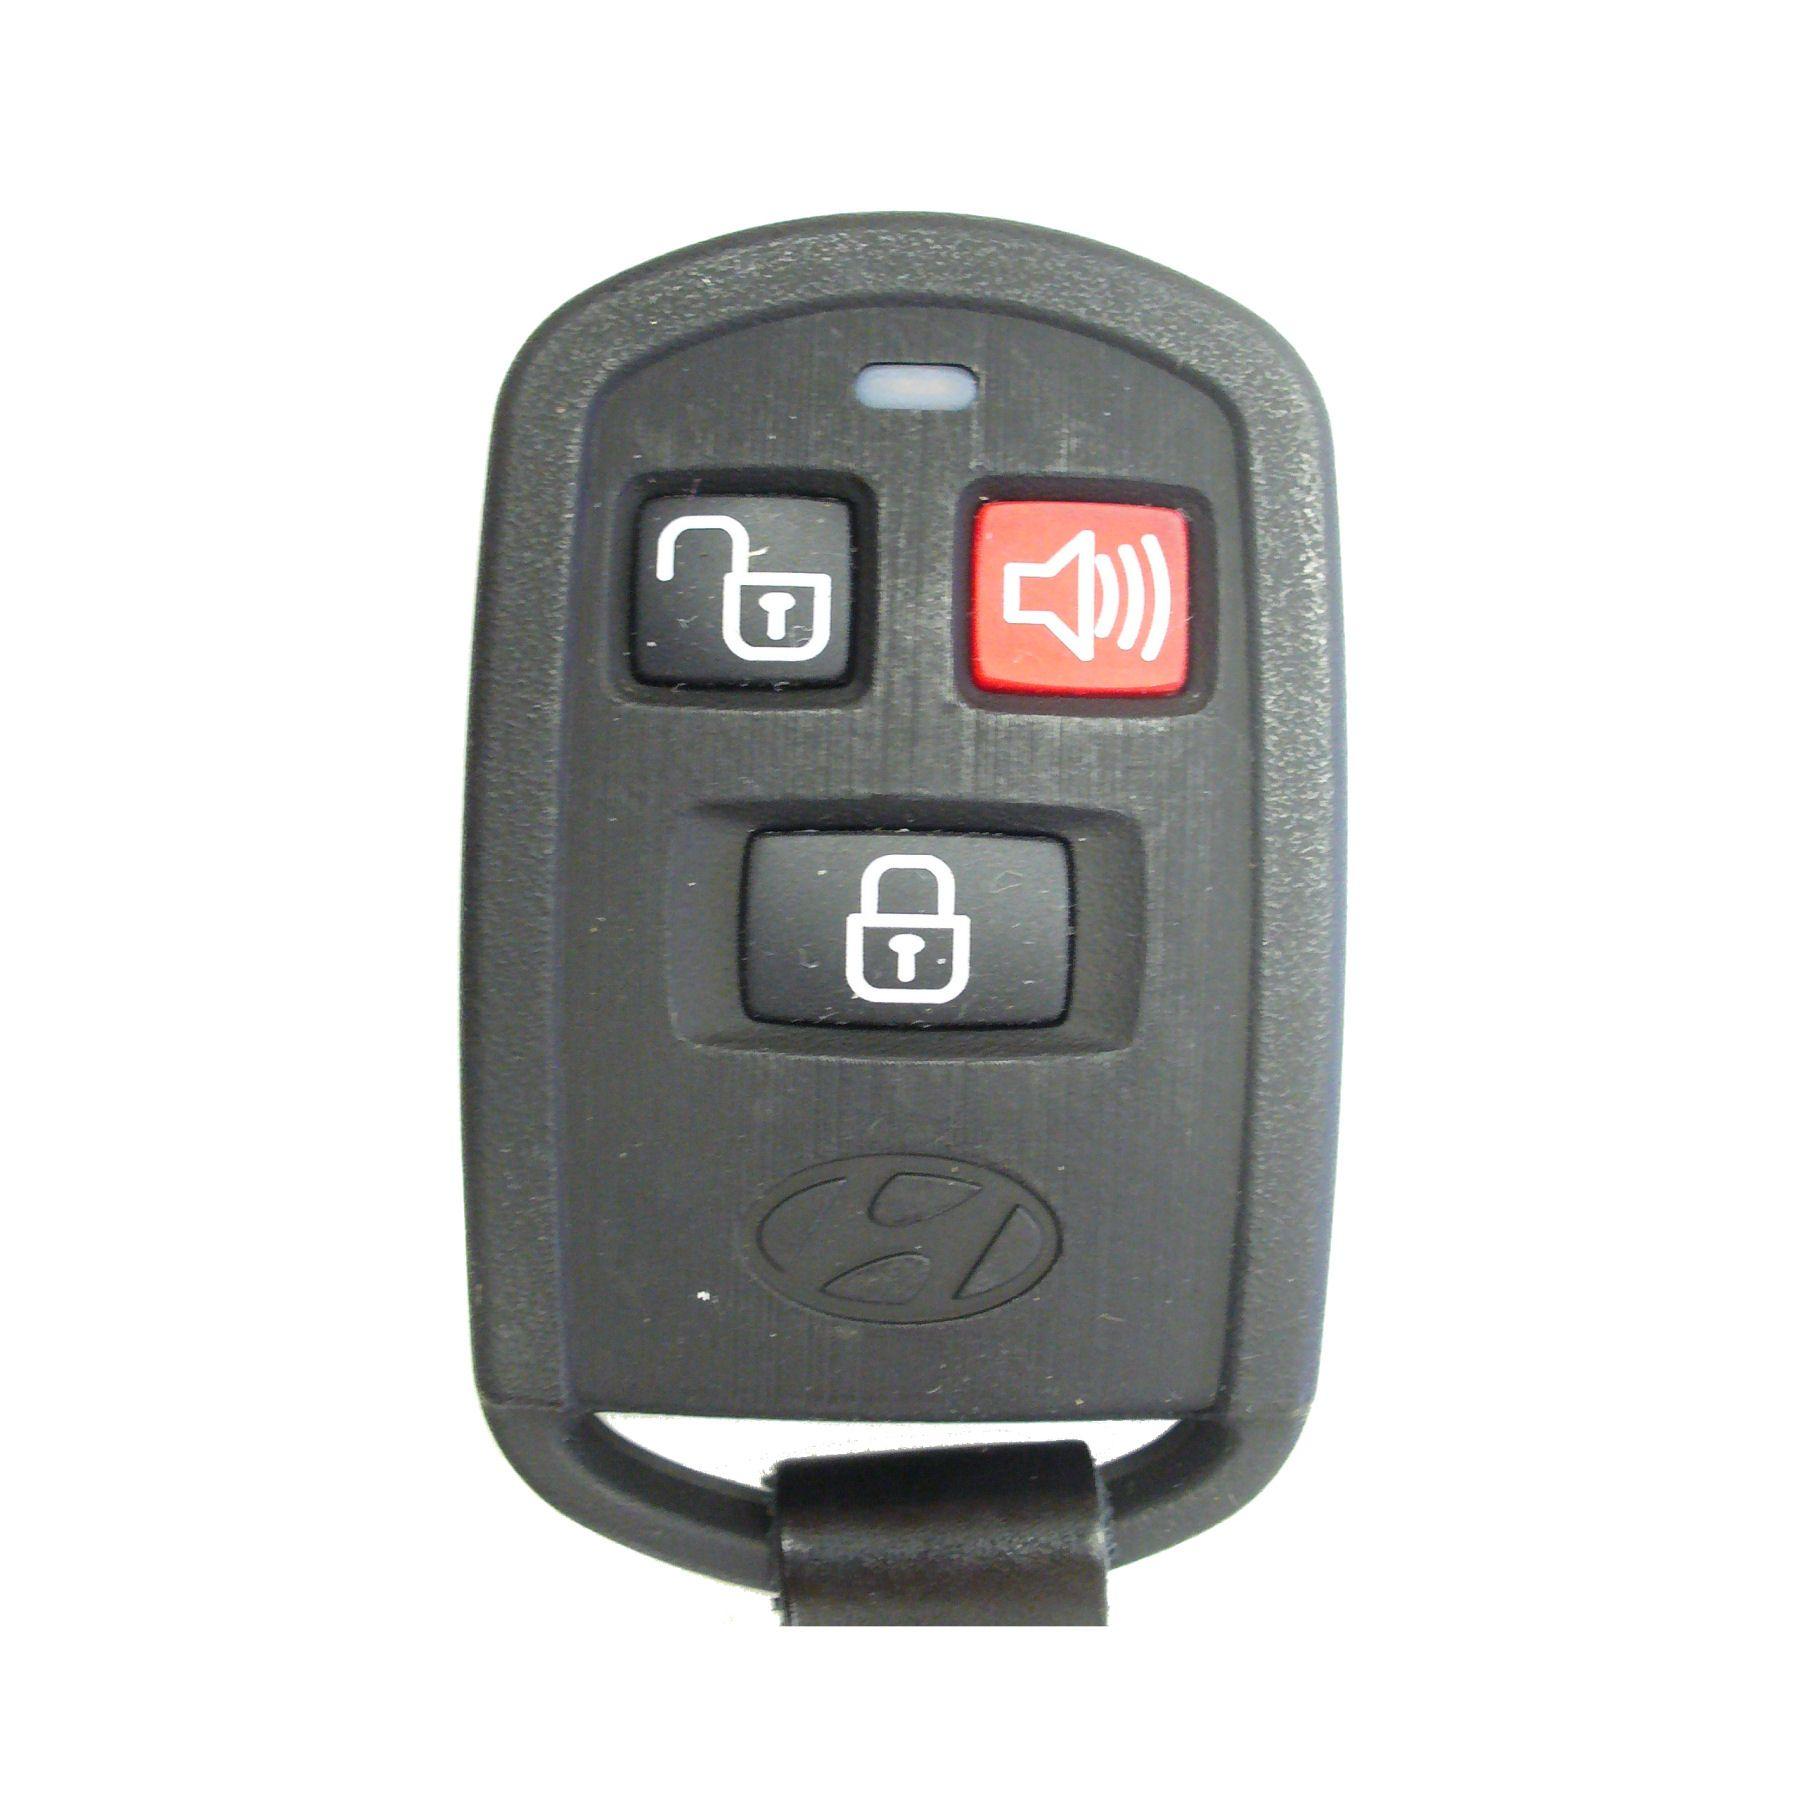 New 3 Button Hyundai Santa Fe Key Fob Remote 3 Button Key Fob Remote For Make Hyundai Santa Fe Year Hyunsantafe 2003 2004 200 Hyundai Hyundai Santa Fe Key